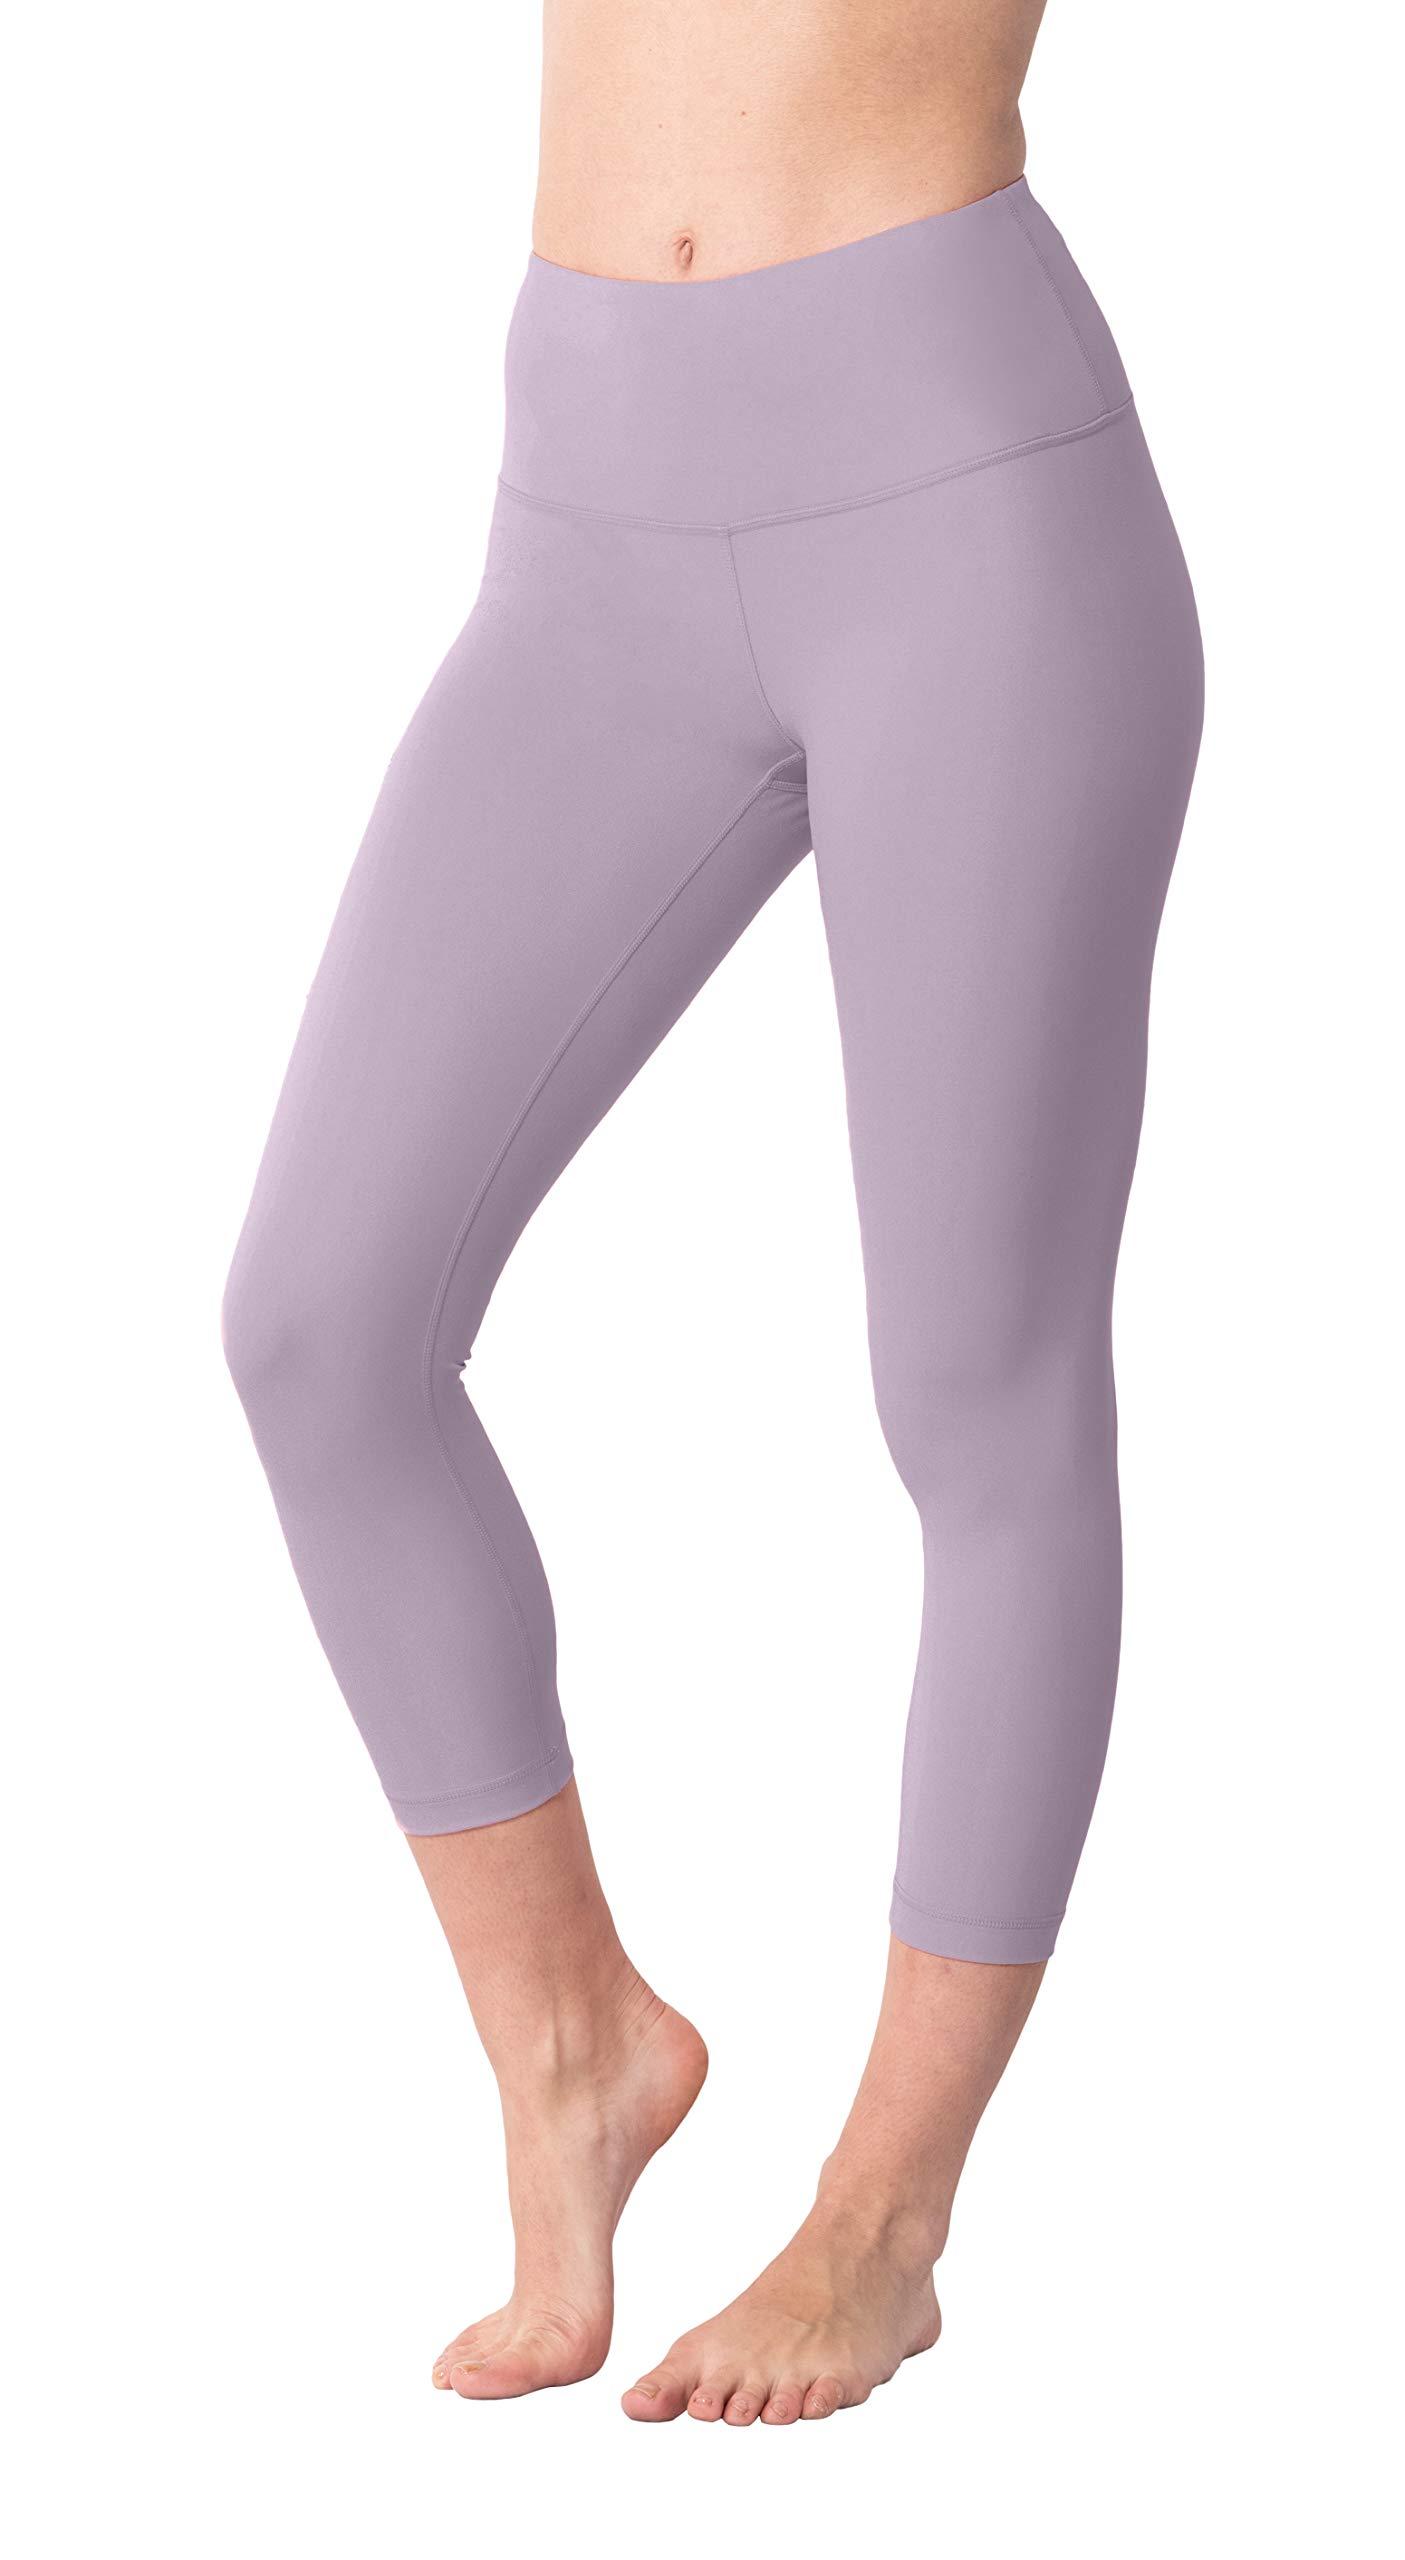 Yogalicious High Waist Ultra Soft Lightweight Capris - High Rise Yoga Pants - Iced Mauve - XS